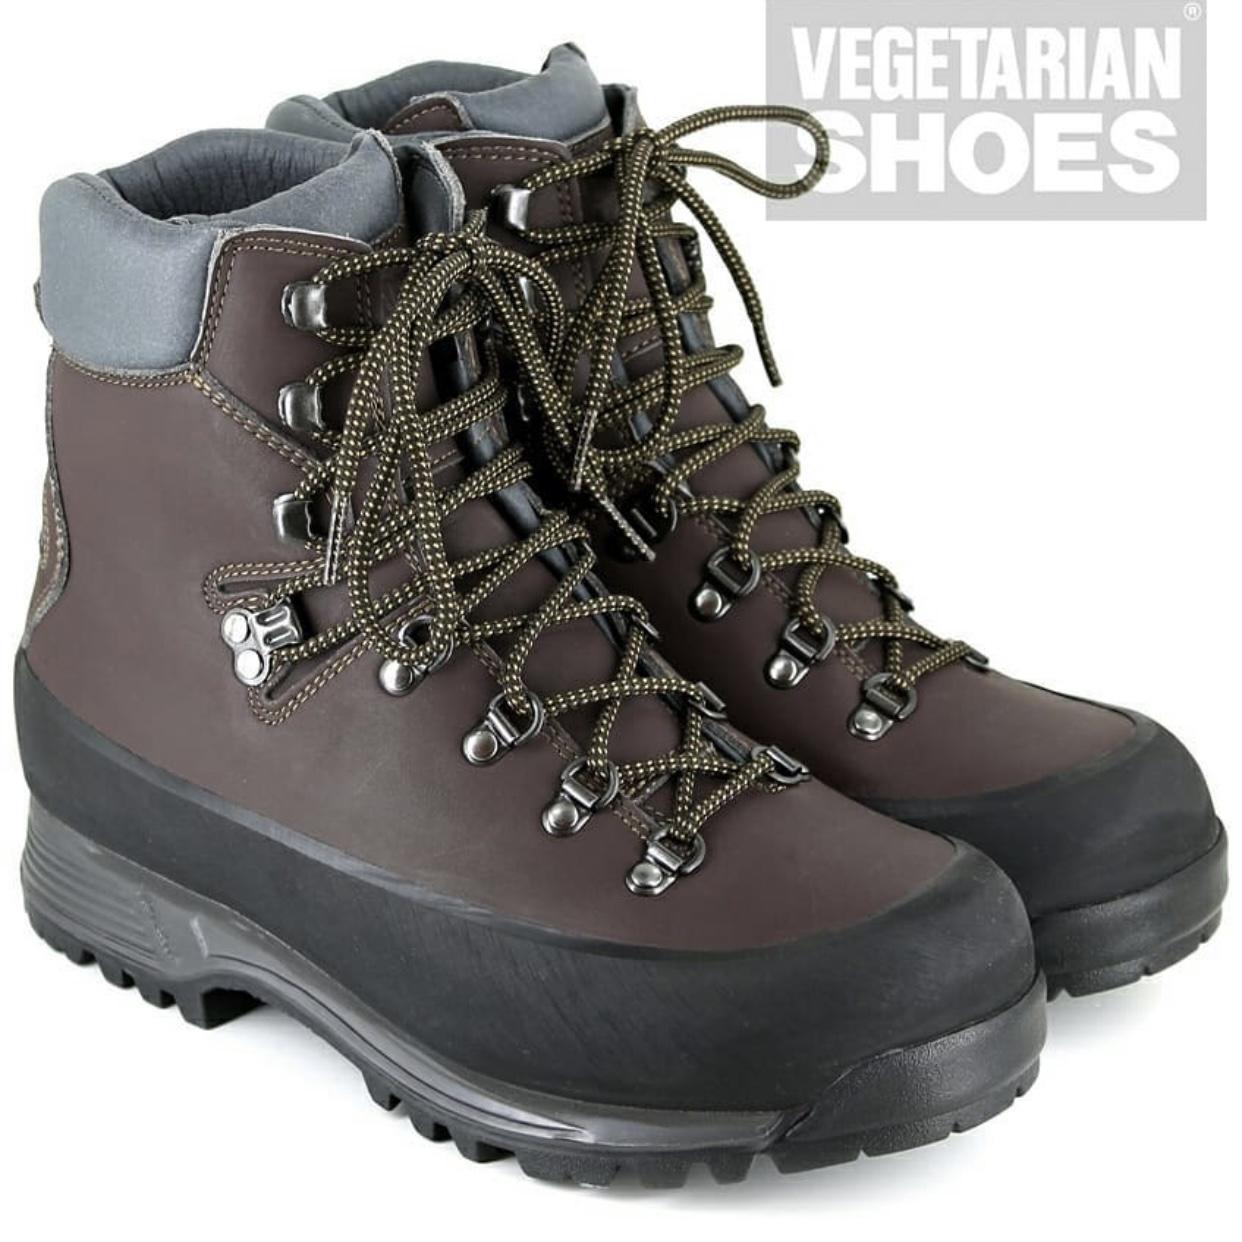 VegNews.VegetarianShoes